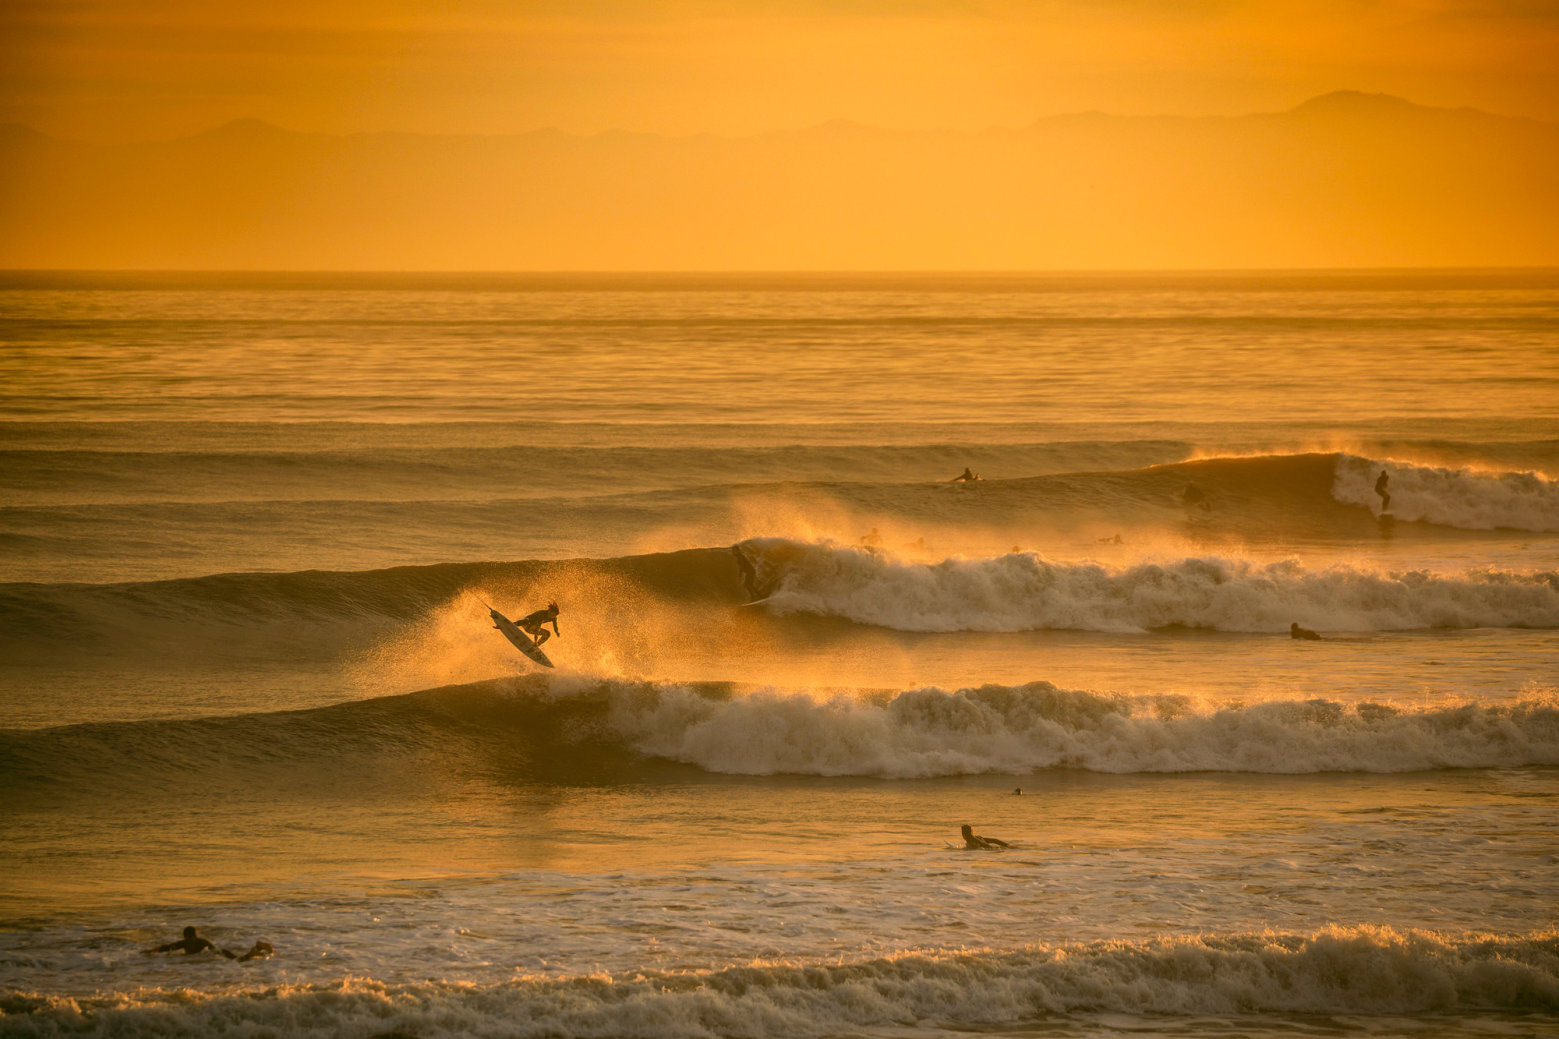 74debe7c3f3 Top 10 Surf Colleges in America - Surfline